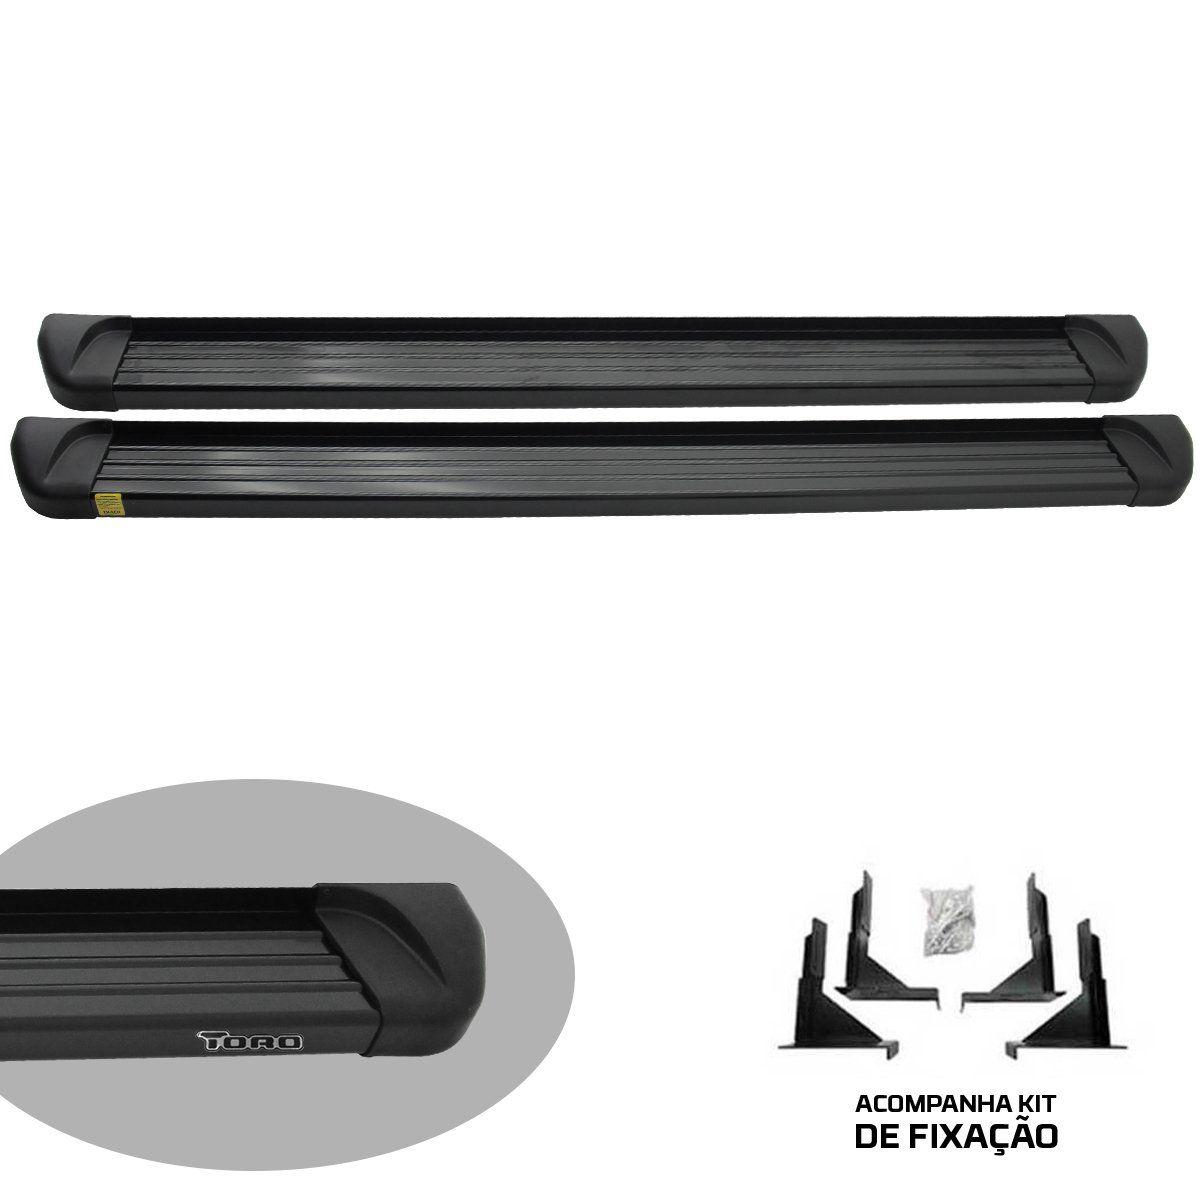 Estribo Track plataforma alumínio preto Fiat Toro 2017 a 2022